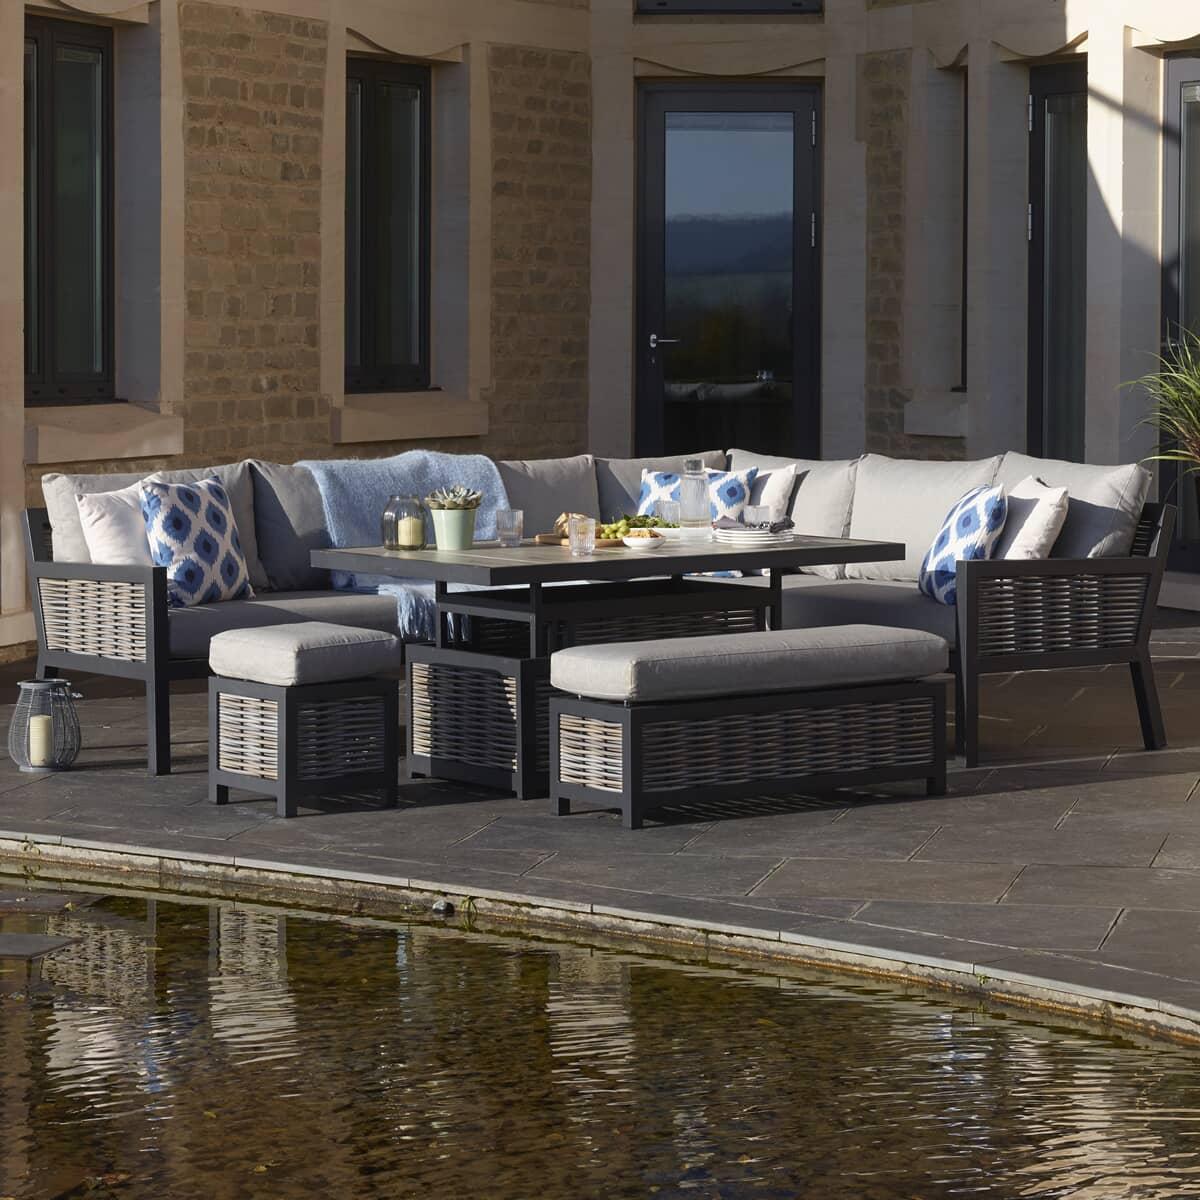 Bramblecrest Portofino Wicker Rectangle Modular Sofa With Adjustable Ceramic Top Table Bench